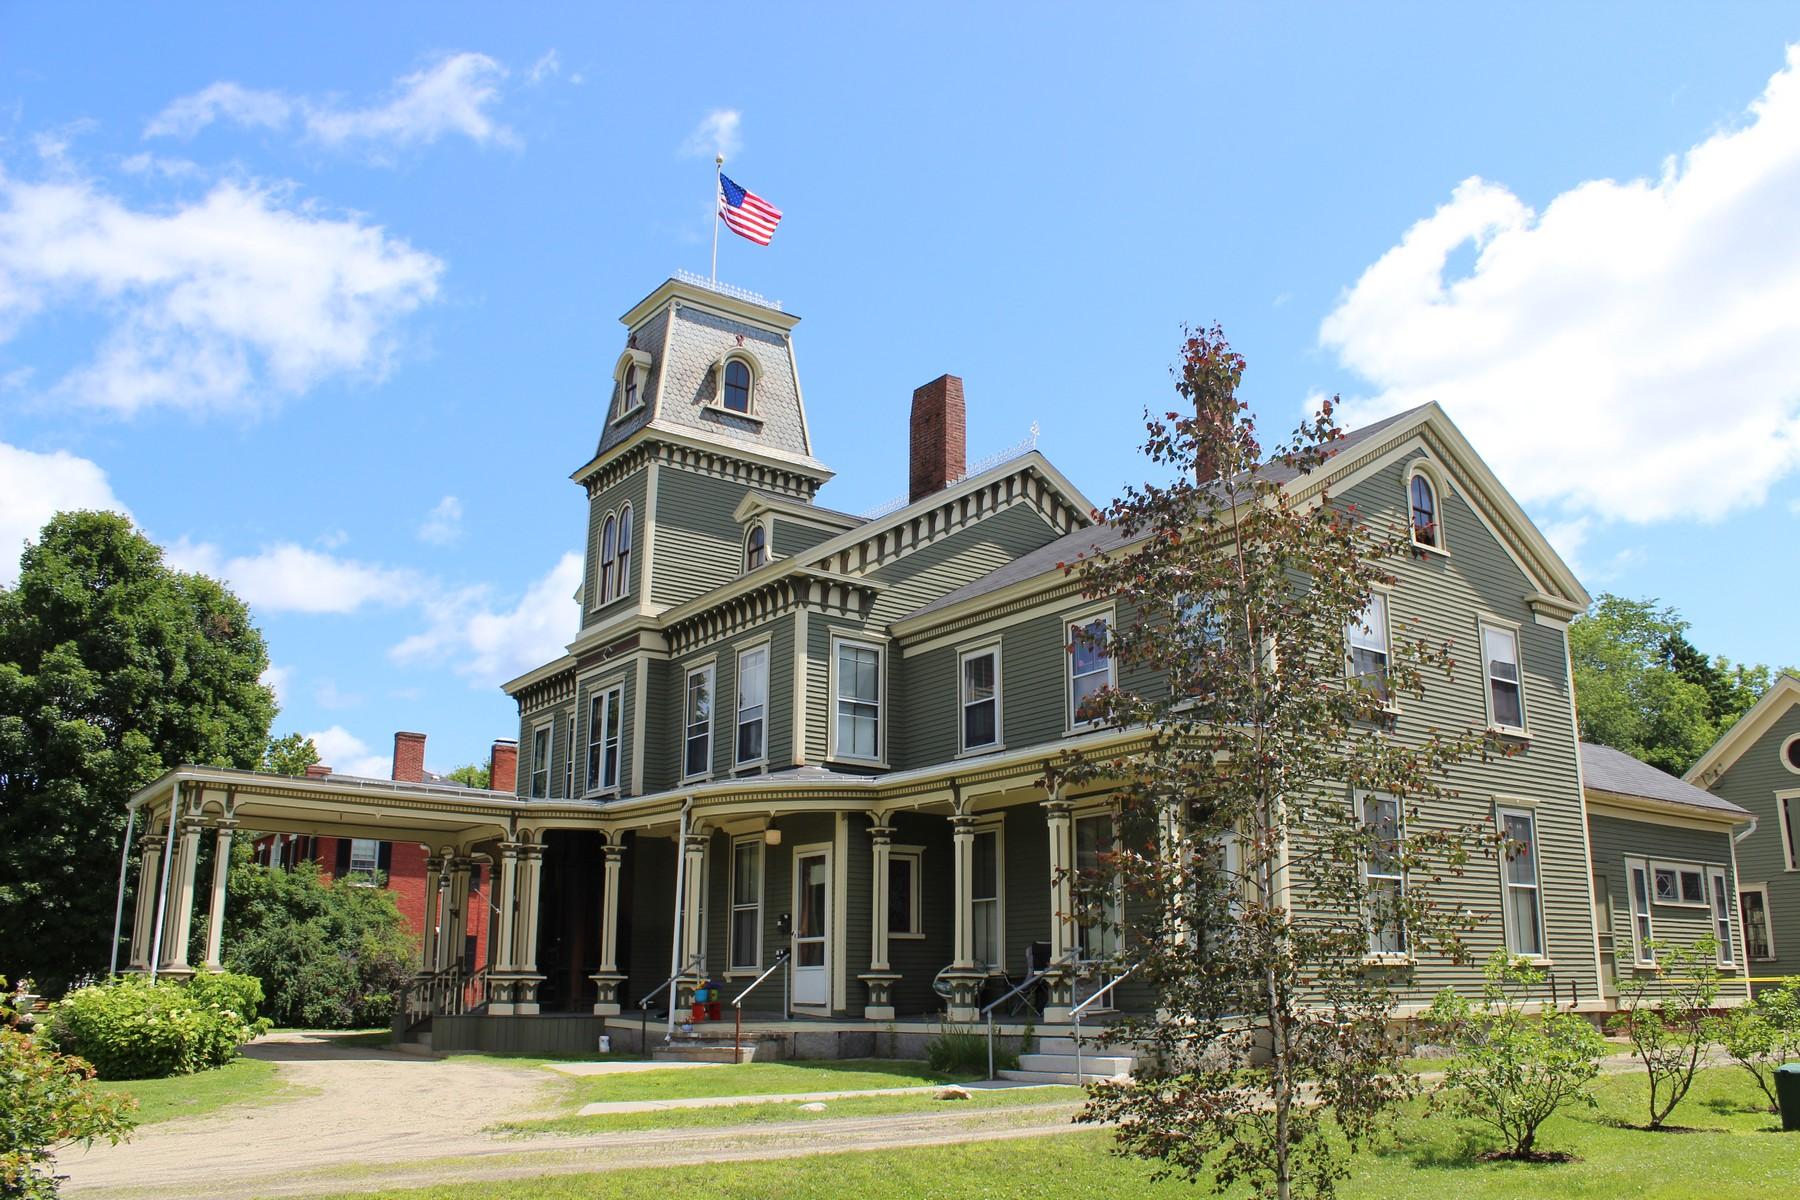 Casa multifamiliare per Vendita alle ore 1496 Main Street, St. Johnsbury St. Johnsbury, Vermont, 05819 Stati Uniti